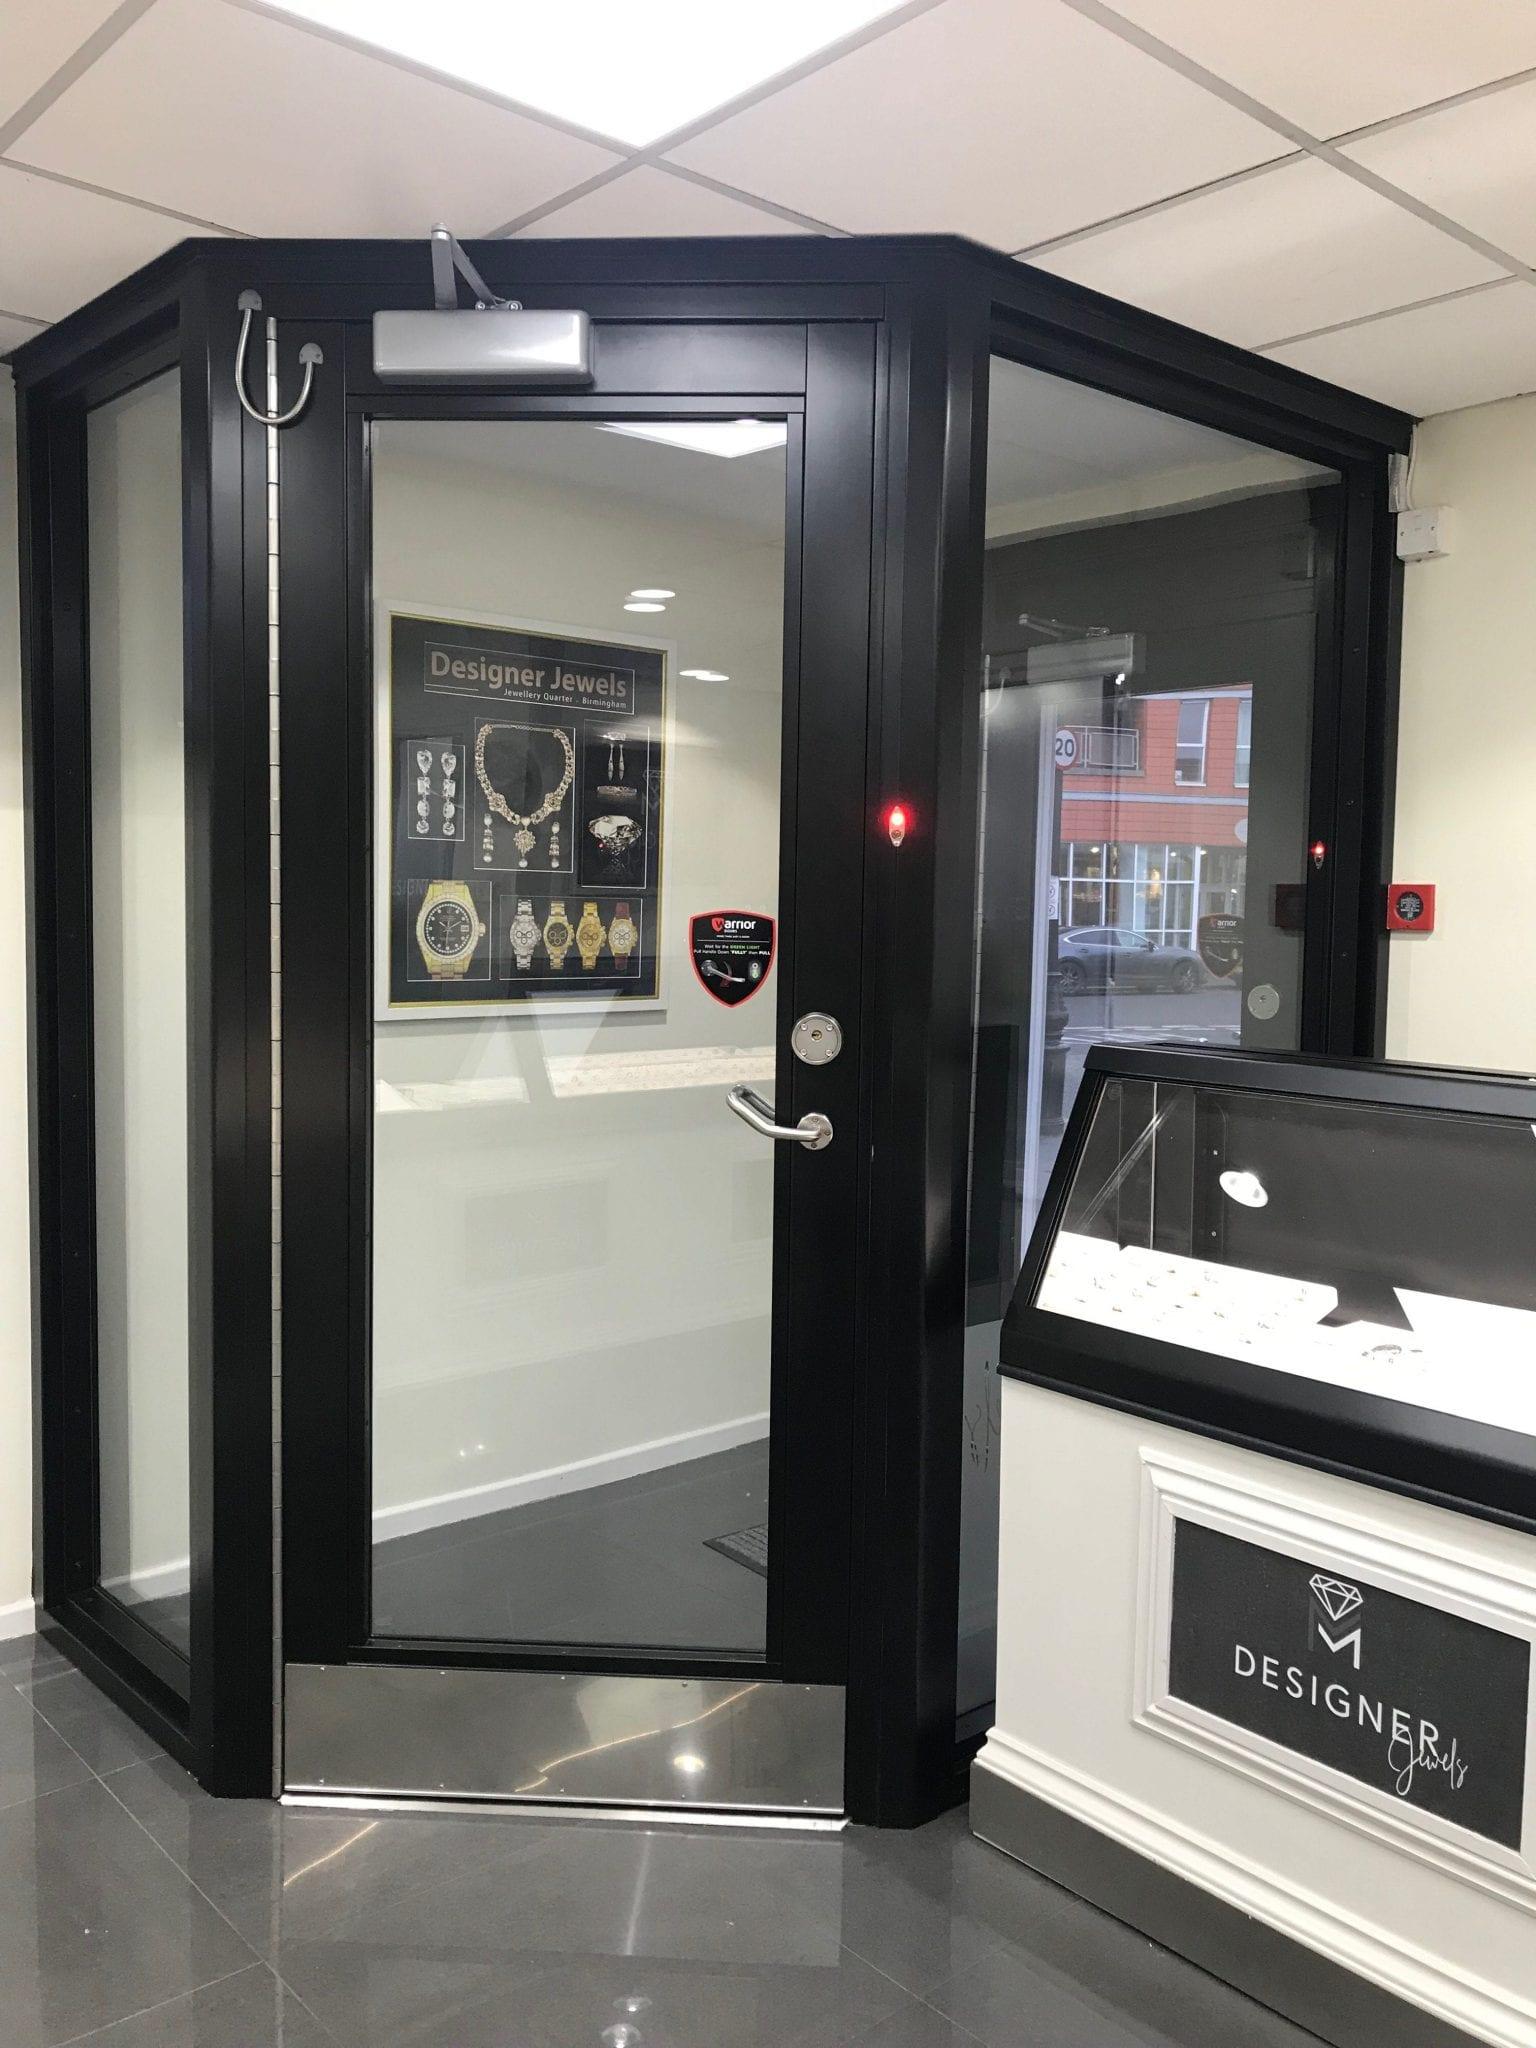 Warrior Fully Glazed Interlocking Swing Doors from the inside of a jewellery shop.